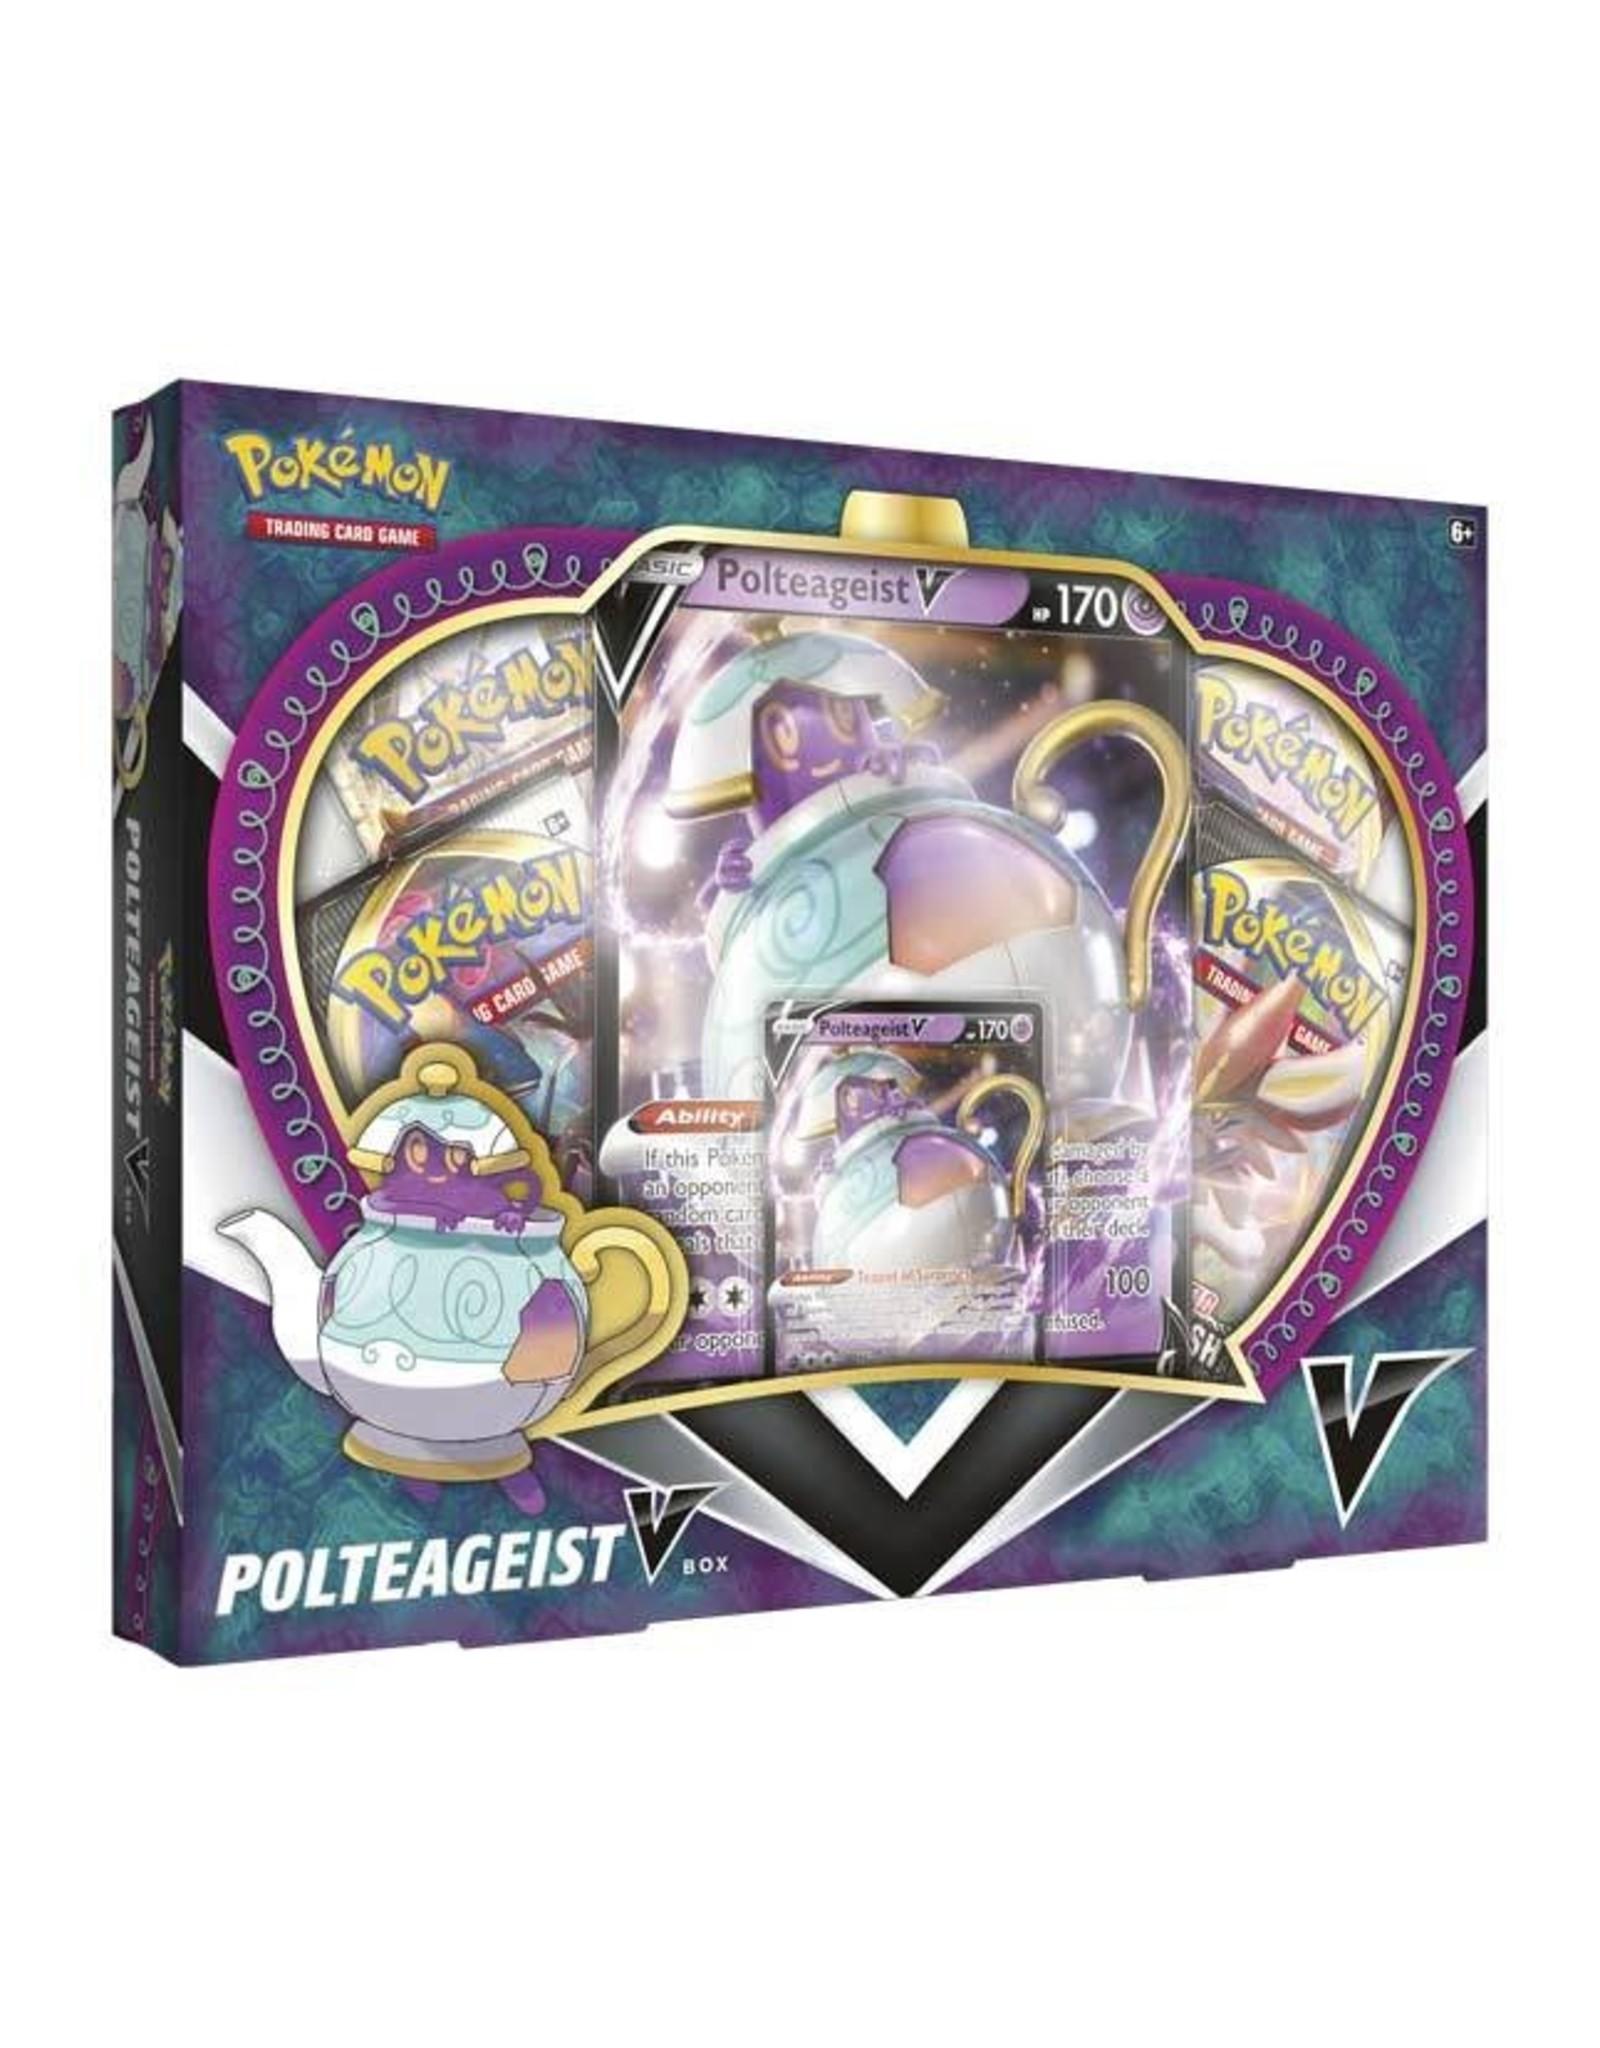 Pokémon Pokémon Trading Card Game: Polteageist V Box